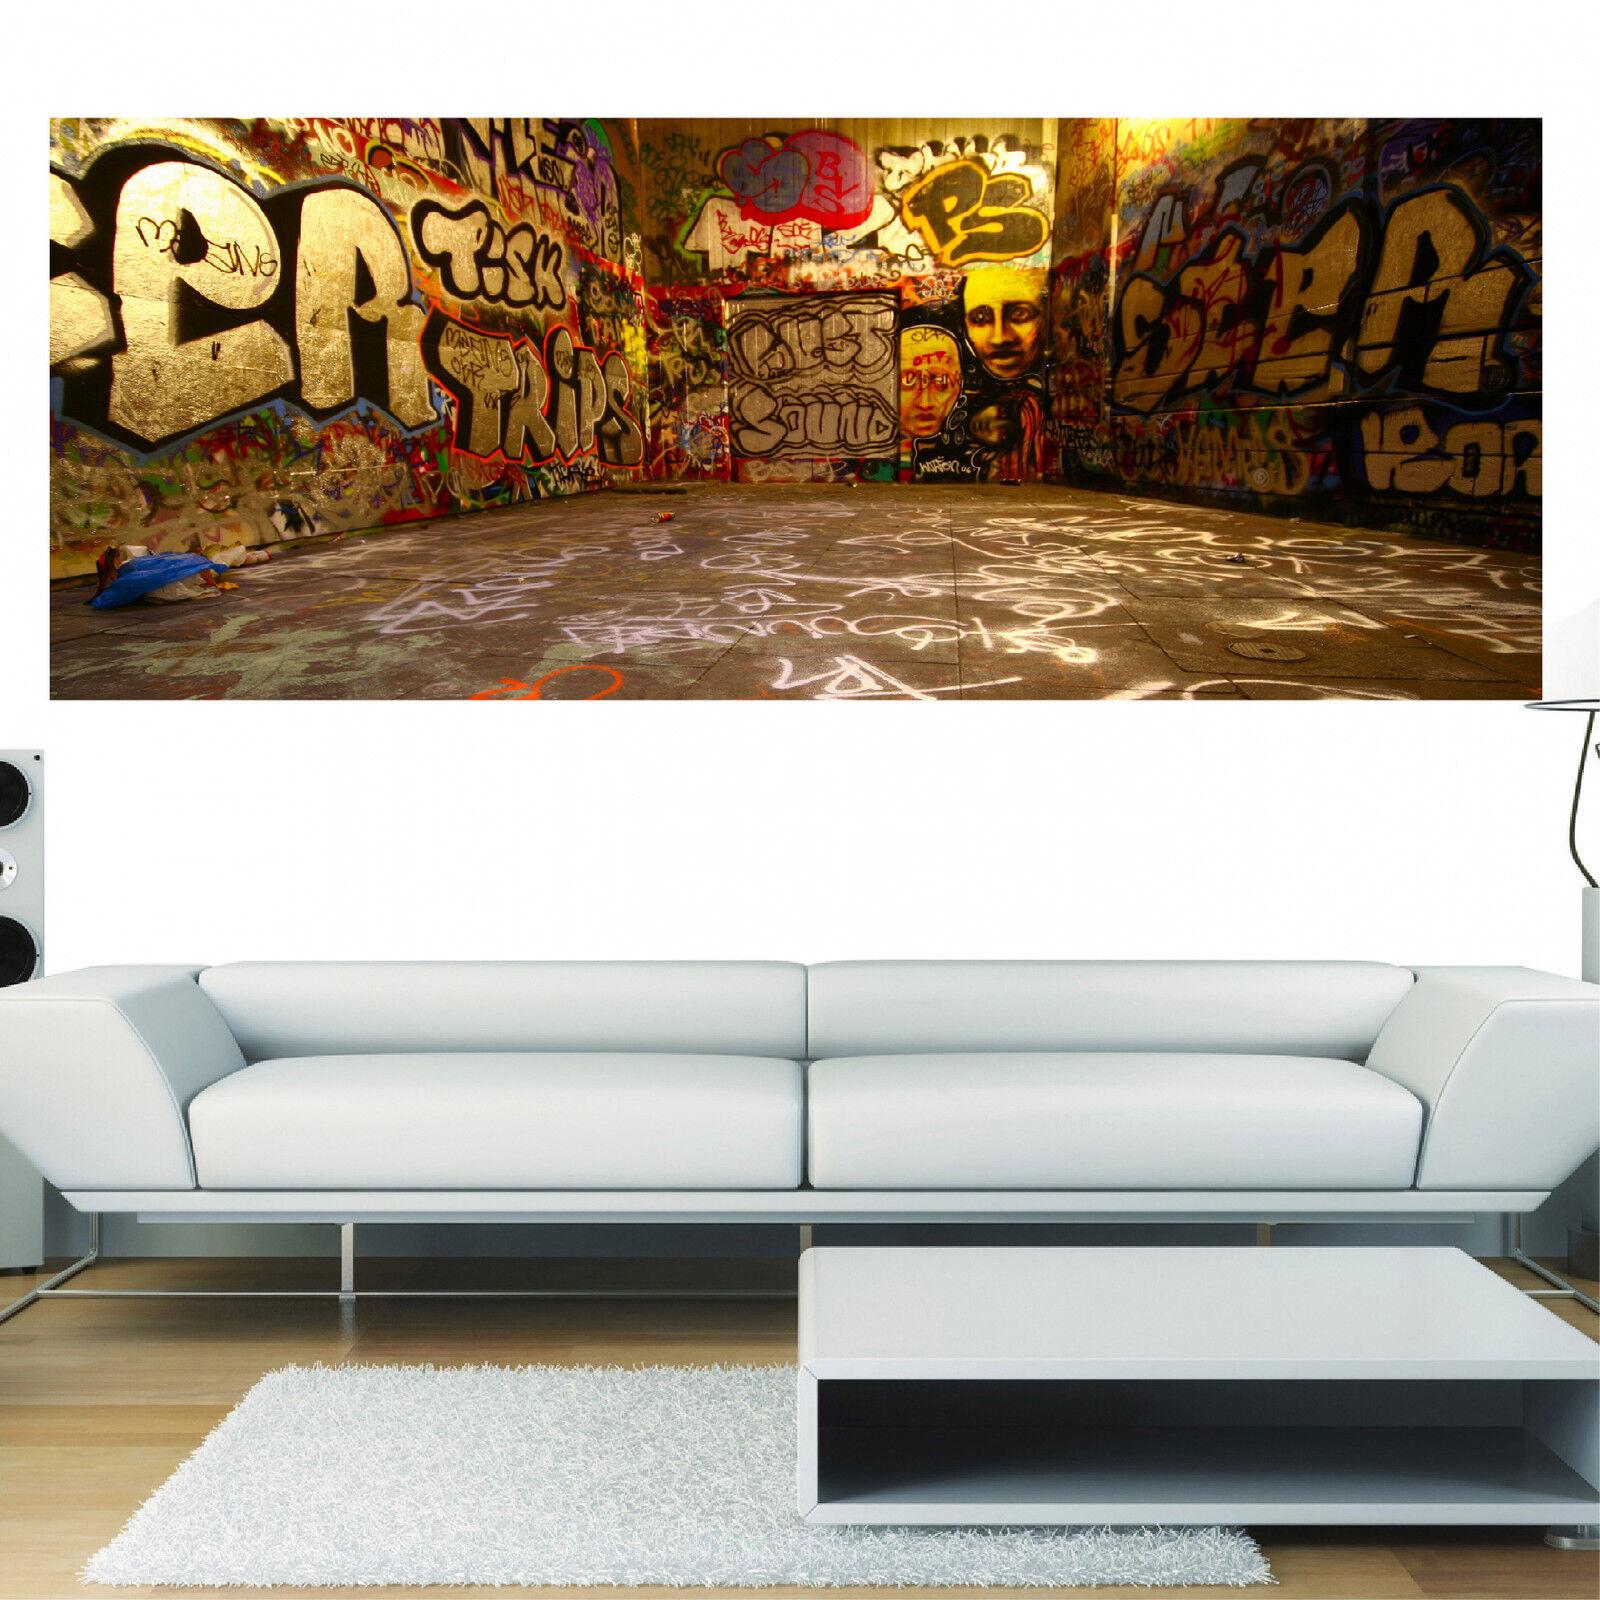 Aufkleber Panorama Deko Wand Tag Graffiti Ref 3618 (13 Größe)